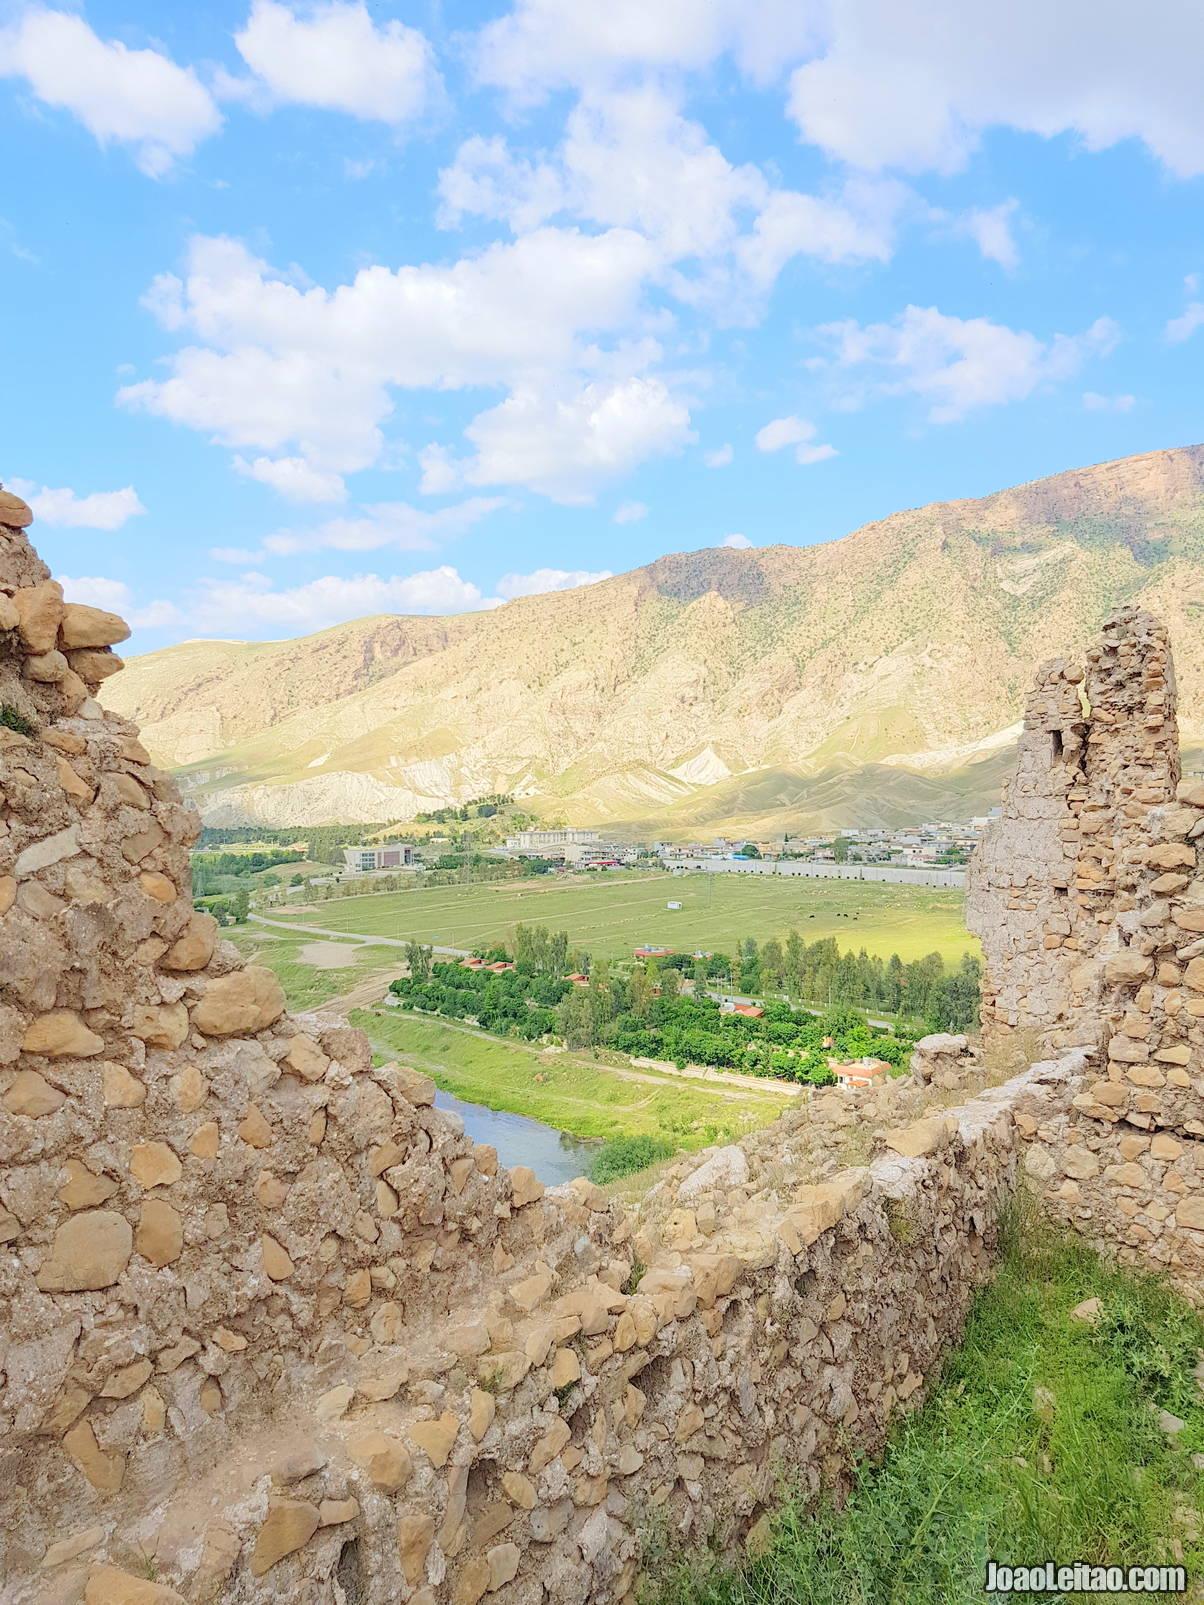 Visit Dokan in Iraqi Kurdistan